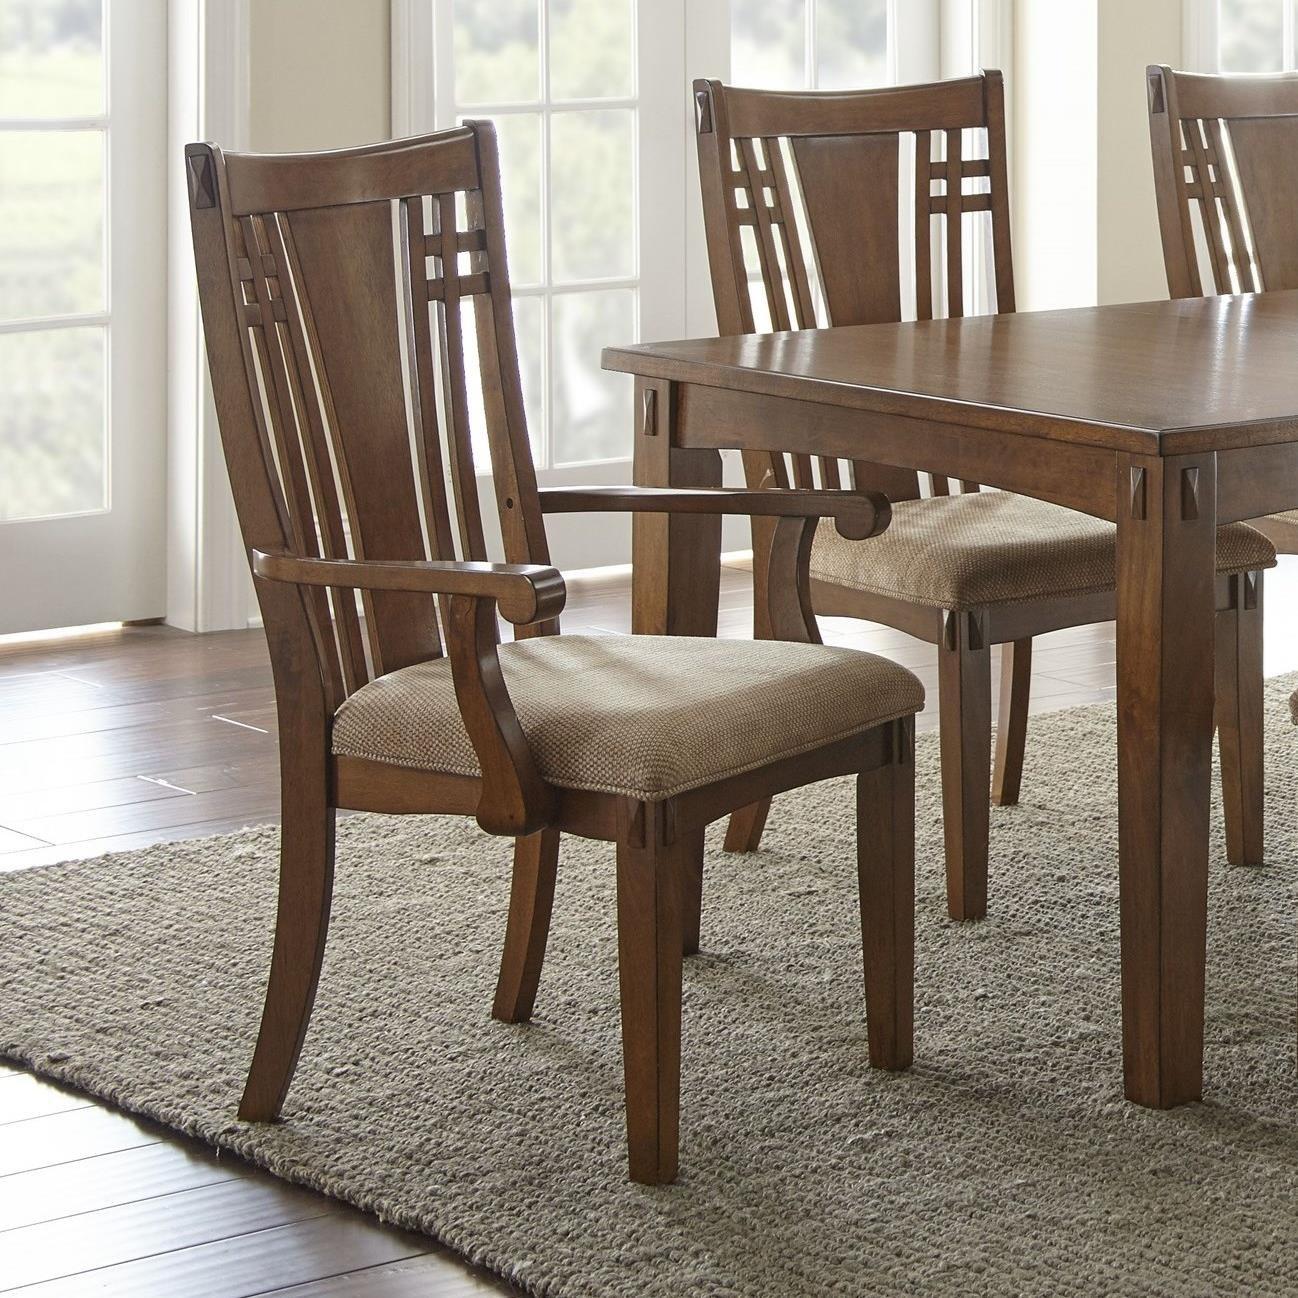 Steve Silver Larkin LK550 Arm Chair - Item Number: LK550A